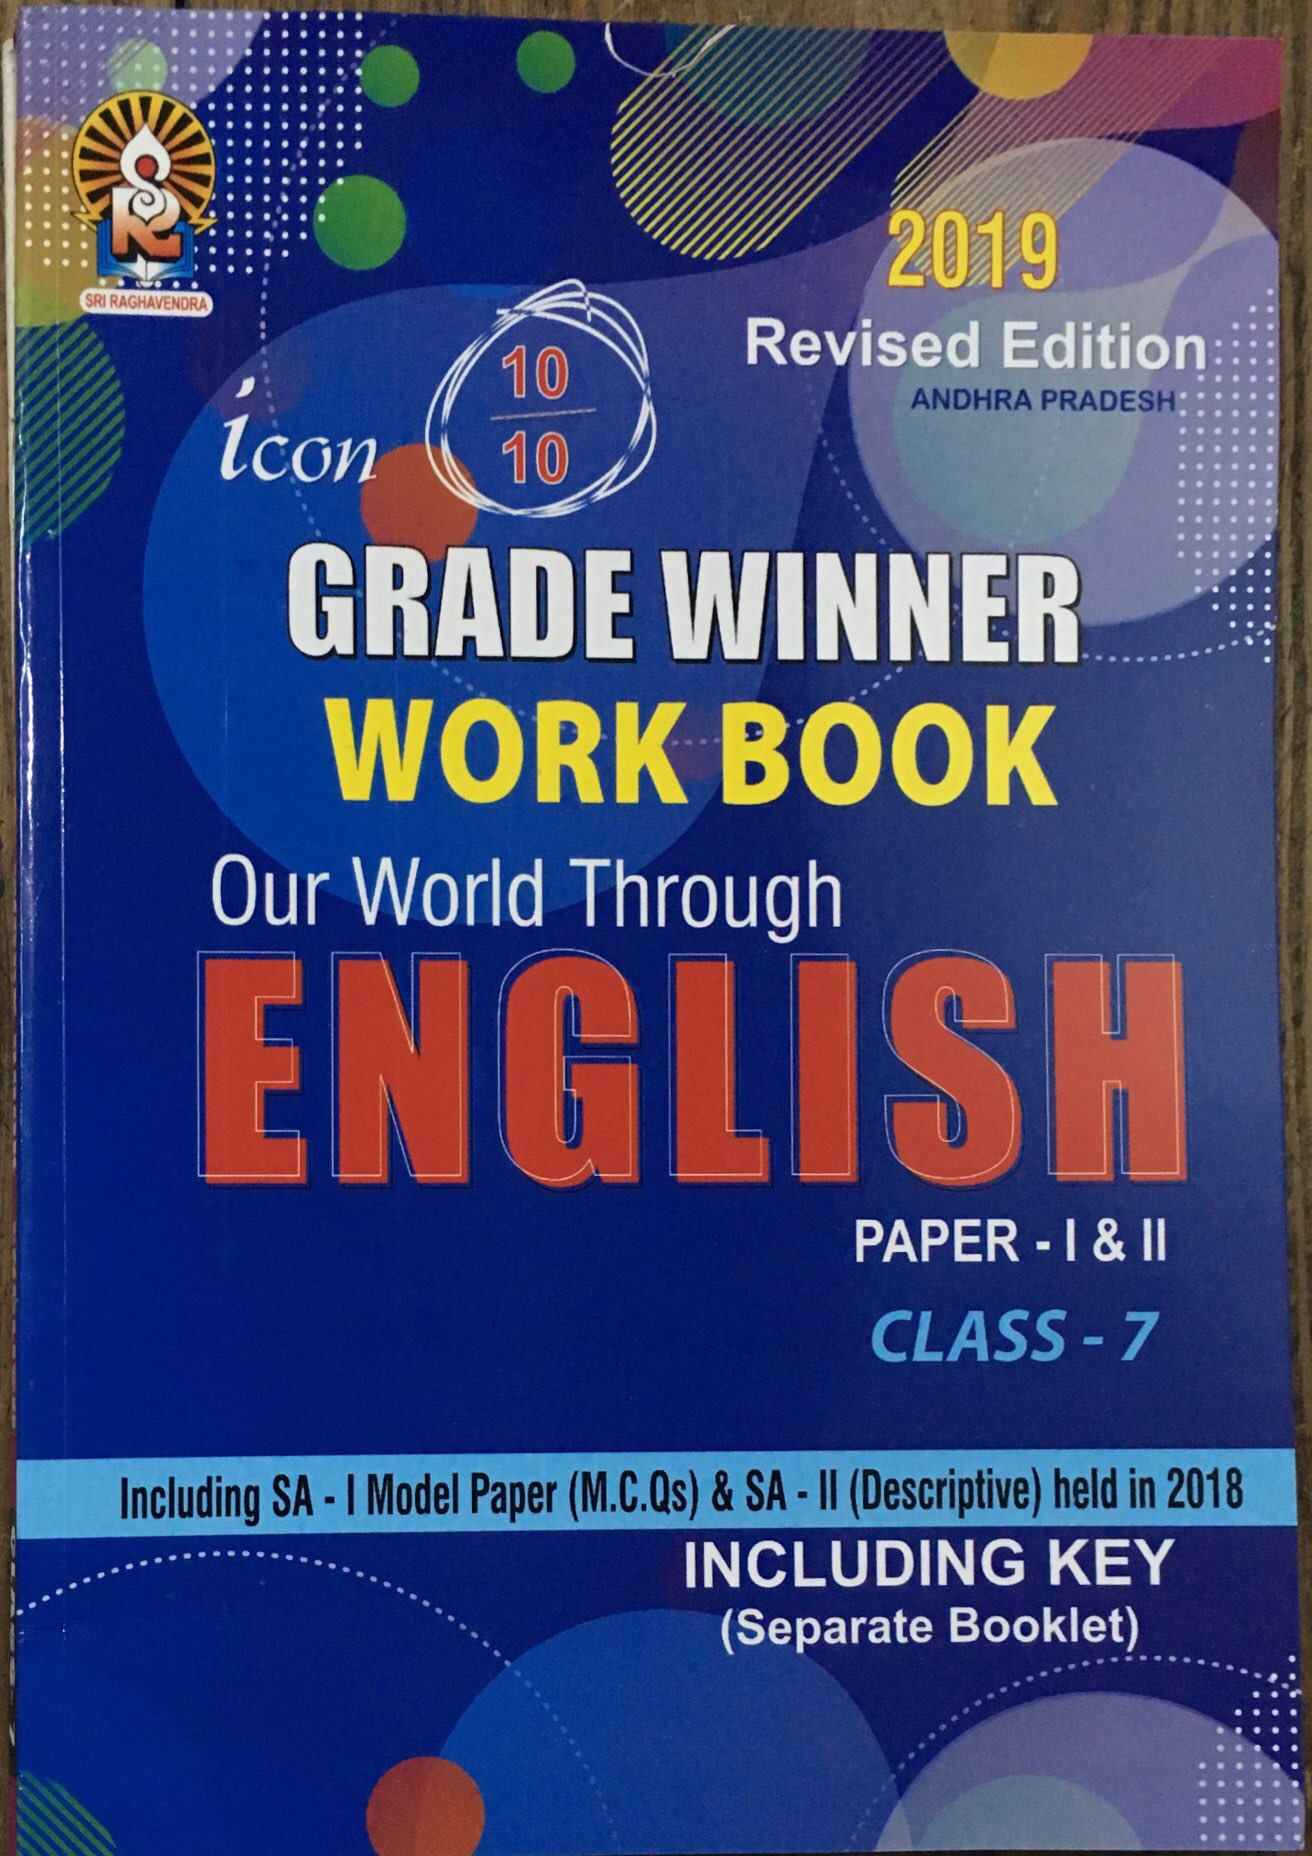 S R  Icon Grade winner Work Book English Class - 7